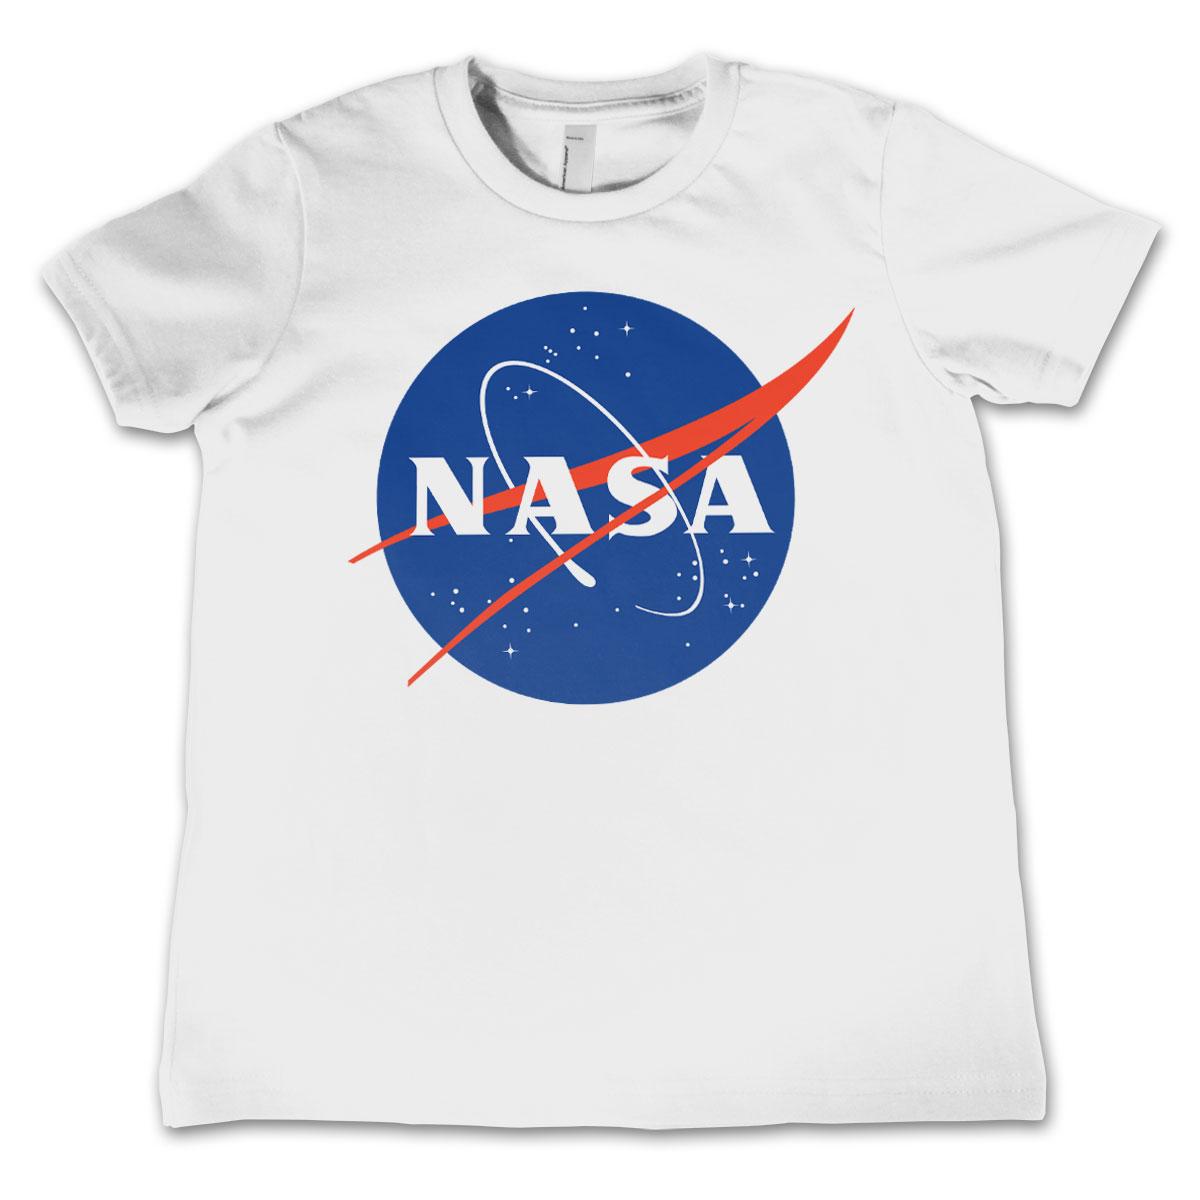 nasa-t-shirt-til-boern